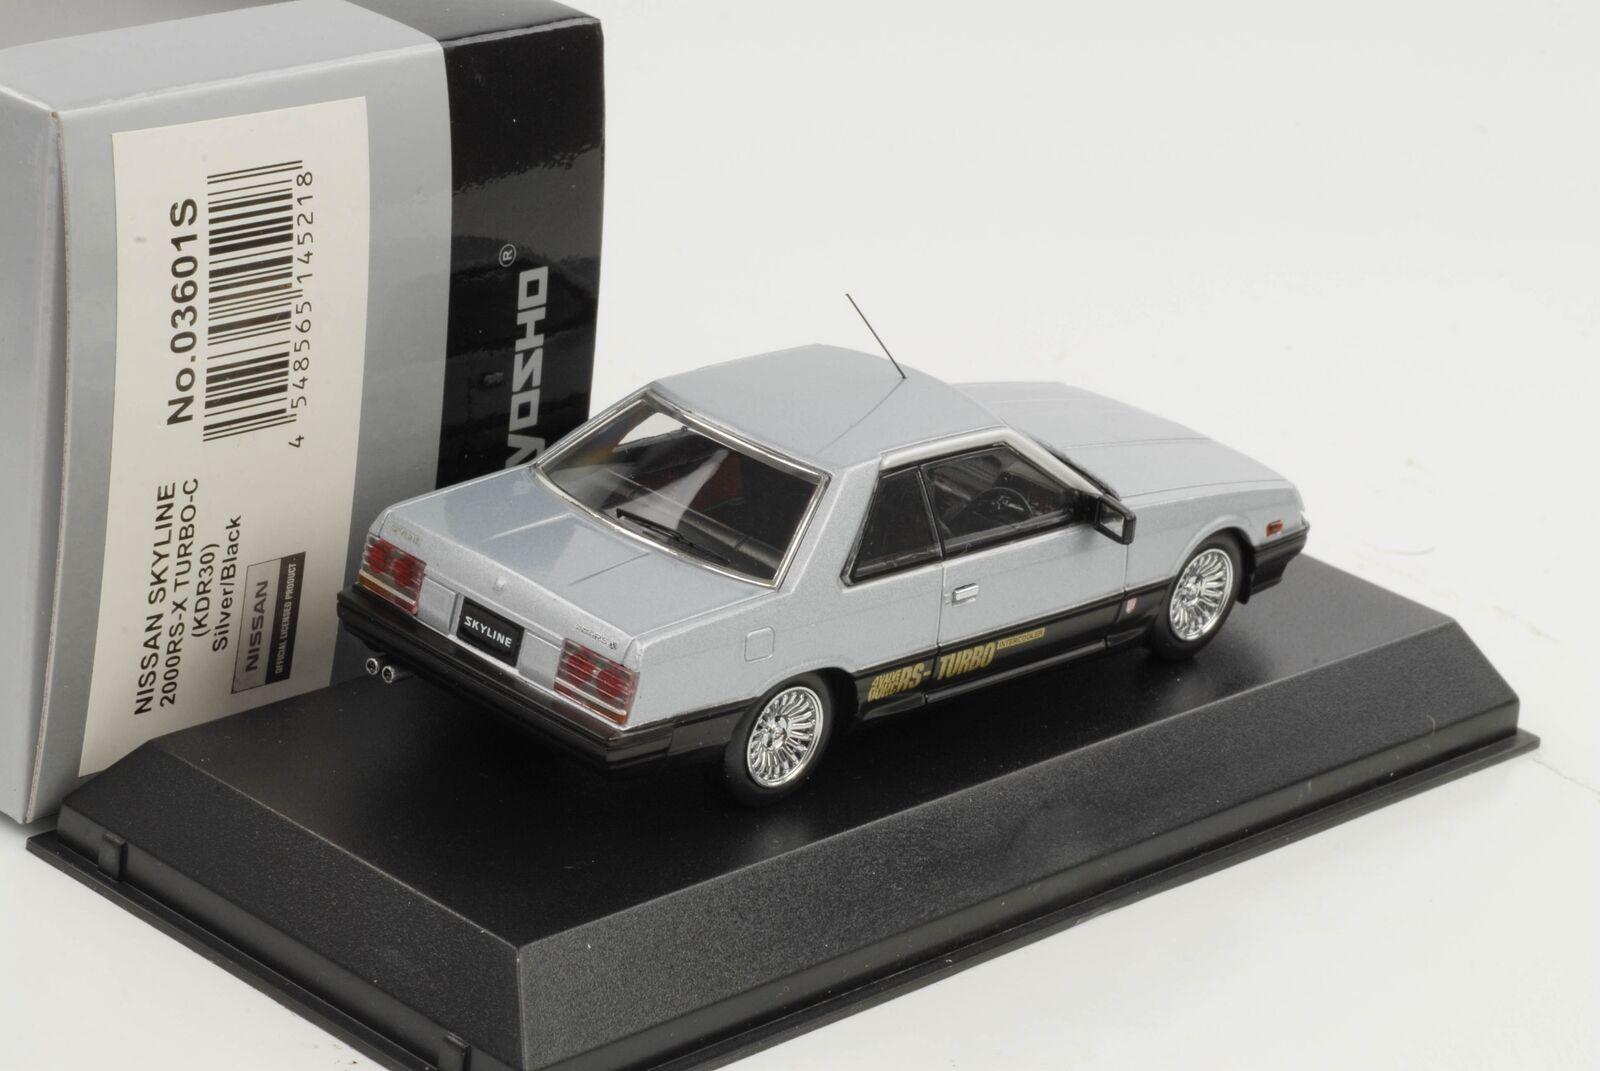 Nissan Skyline 2000rs-x Turbo-C kdr30 argent 1 43 Kyosho QUALITE